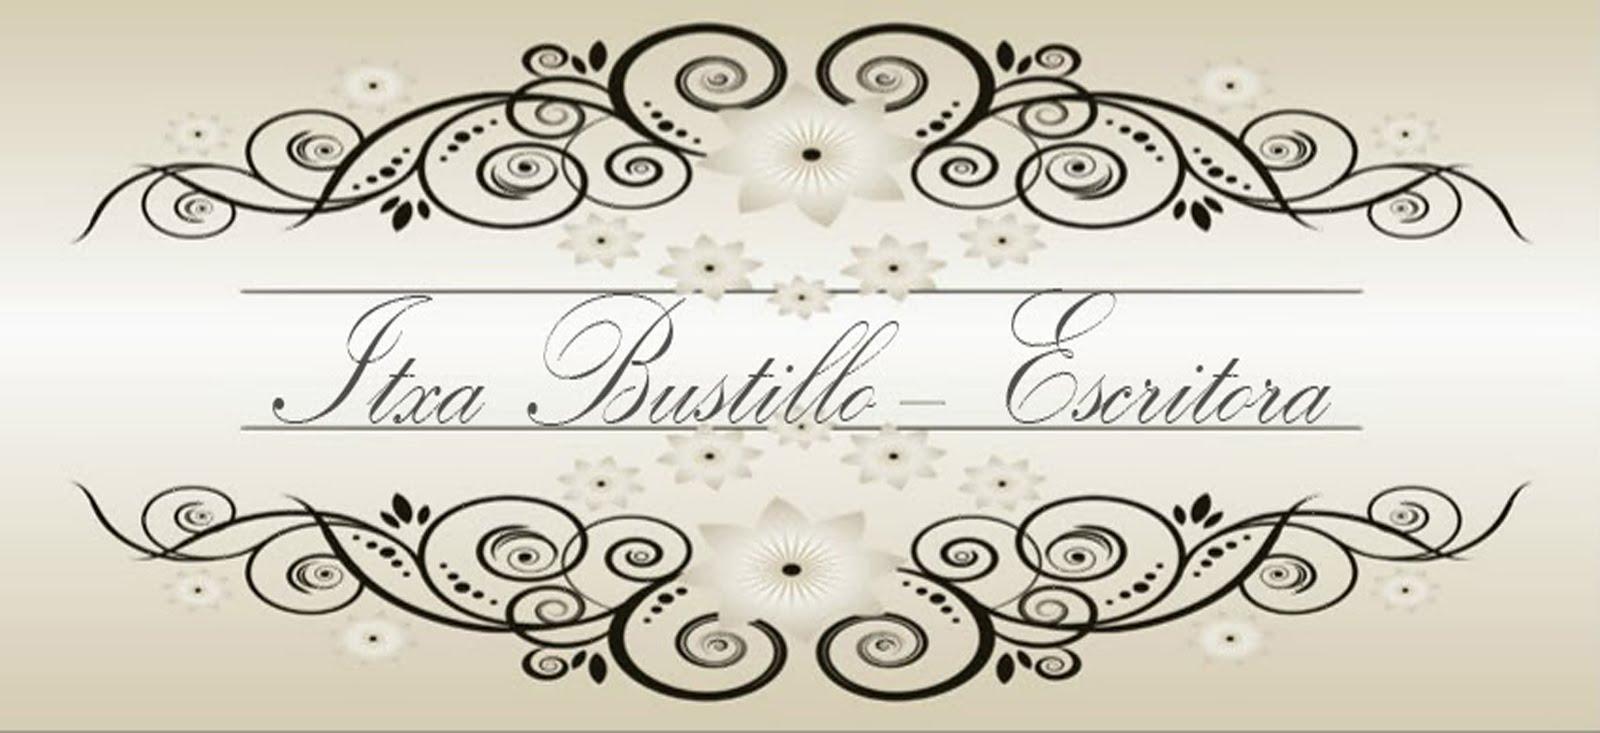 Itxa Bustillo — Escritora